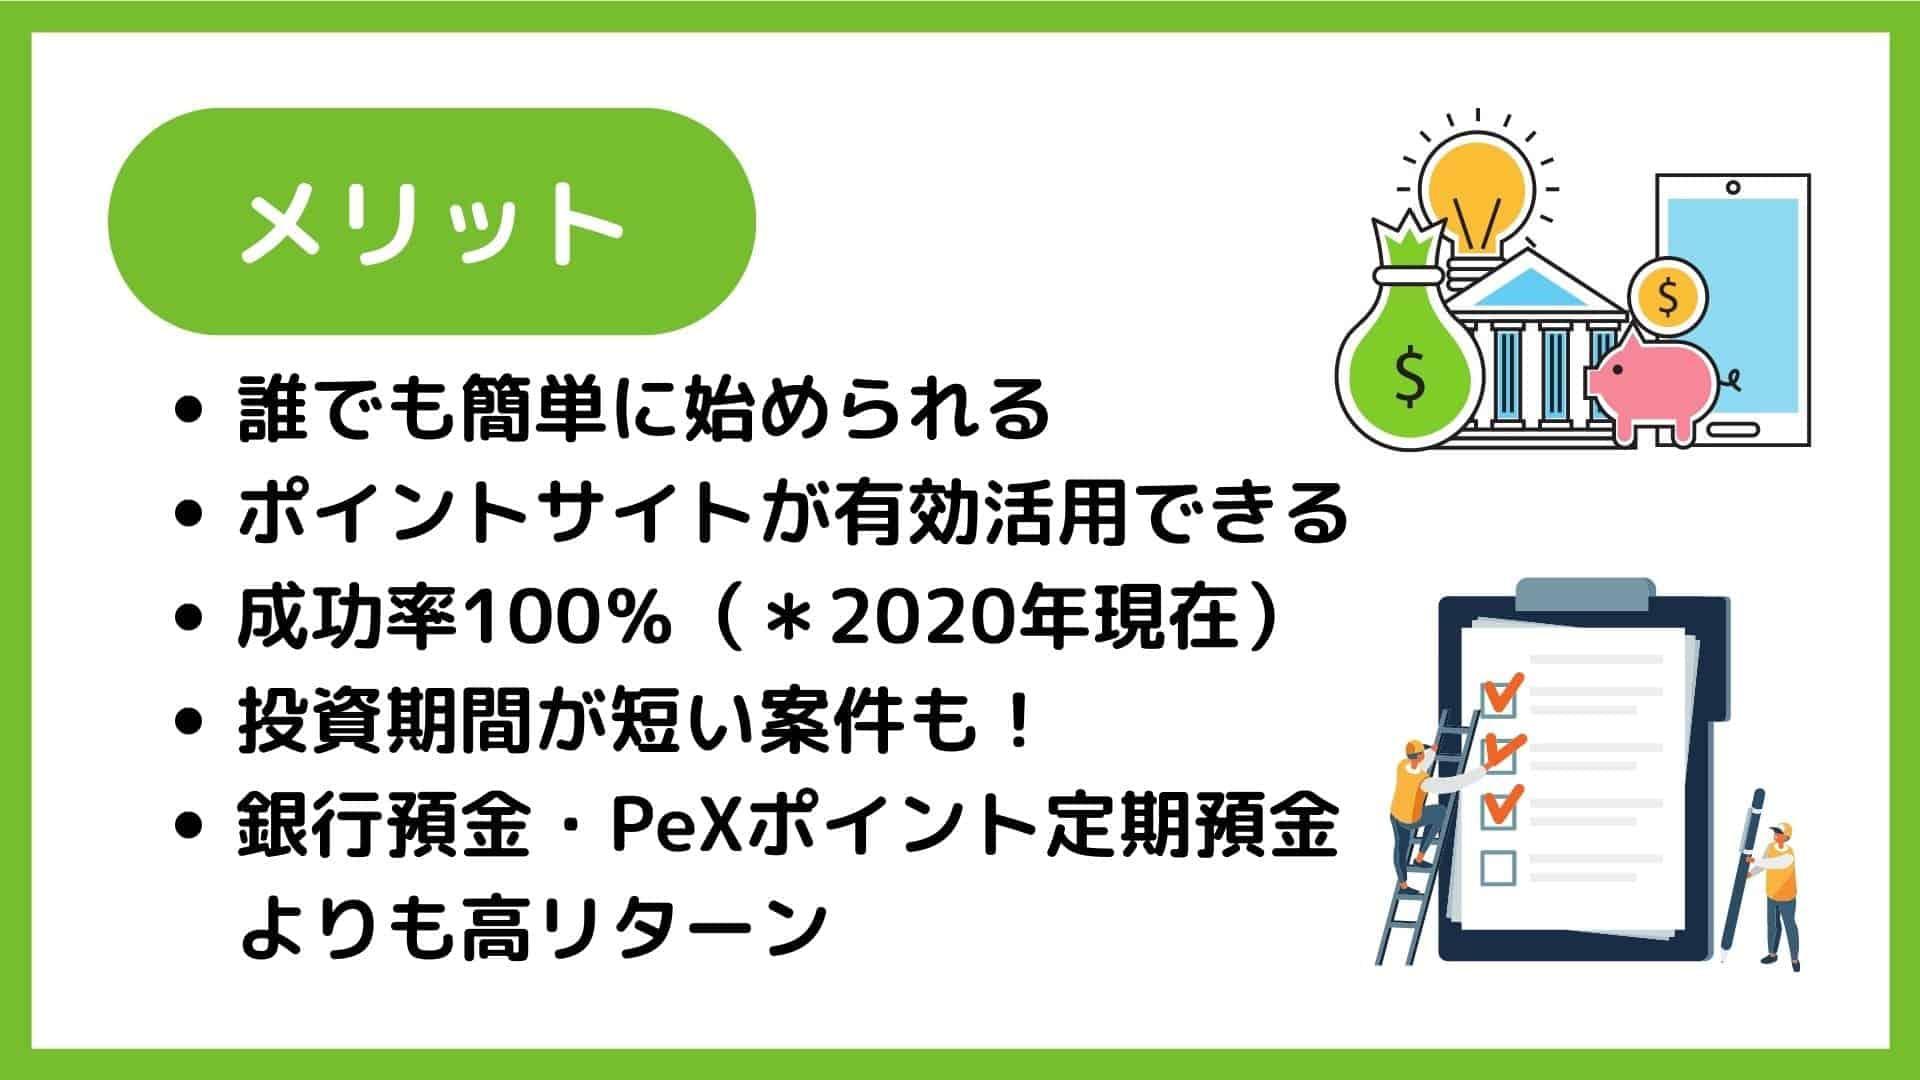 PeXポイント投資のメリット